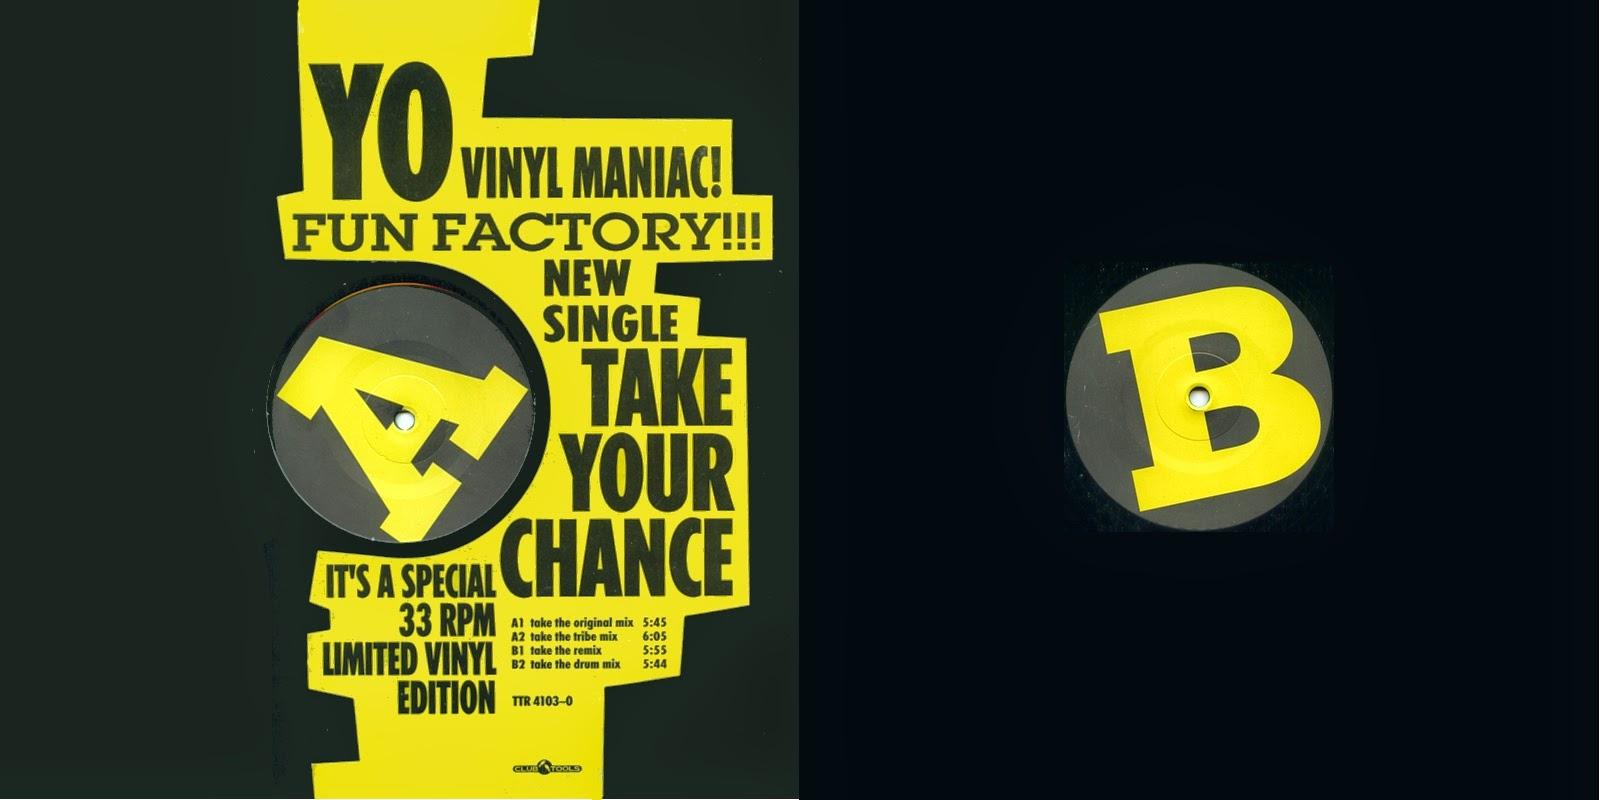 Singles 4 Change: Fun Factory